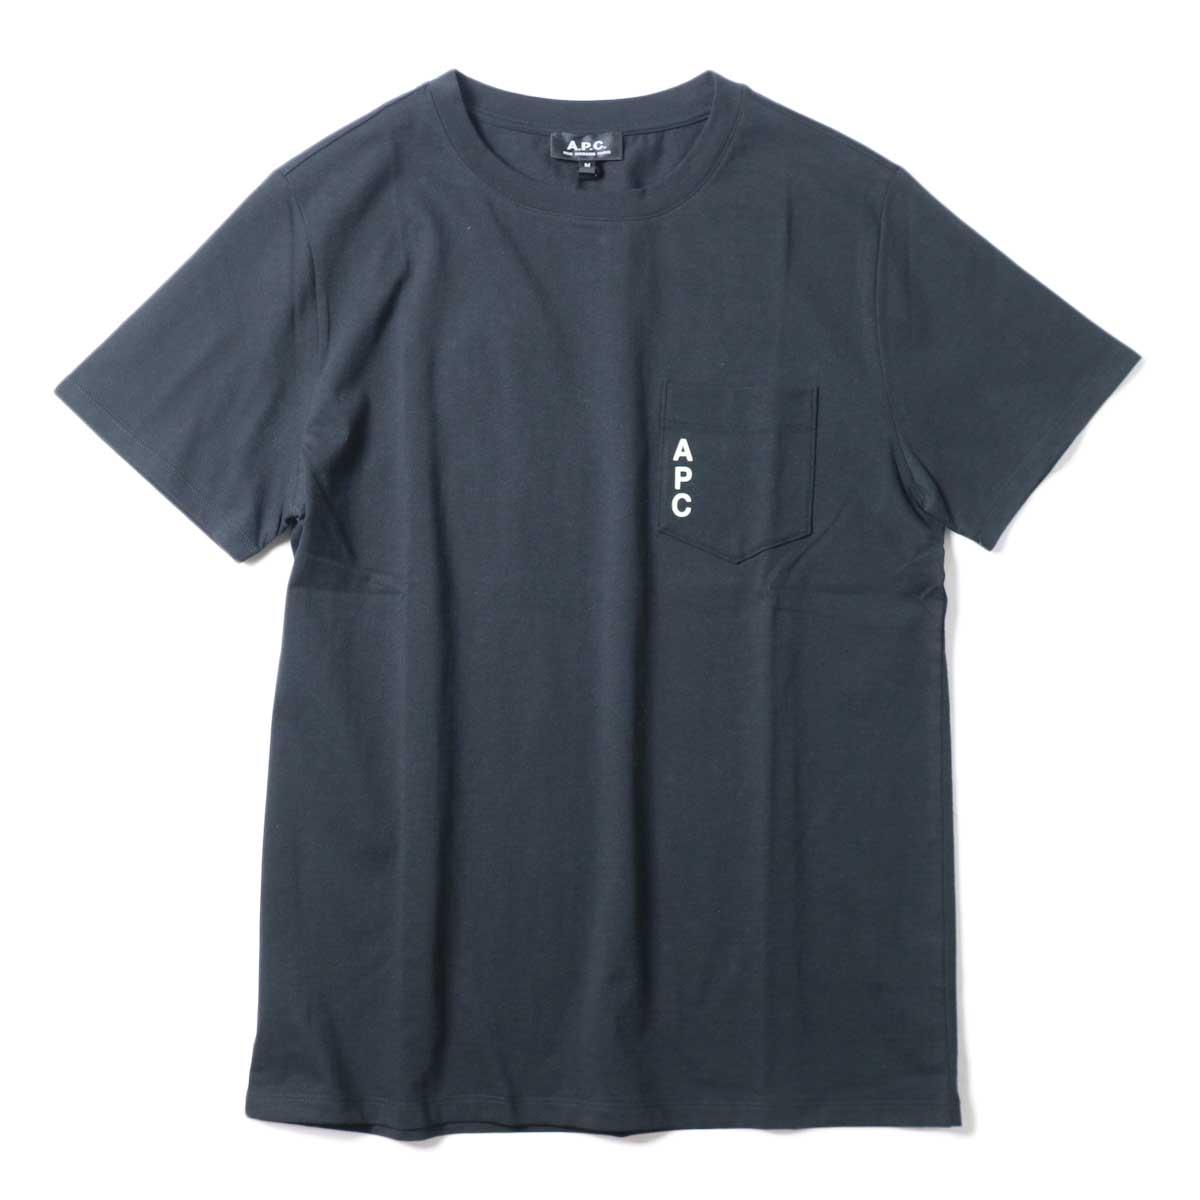 A.P.C. / Crew Neck Pocket Tee (Black) 正面